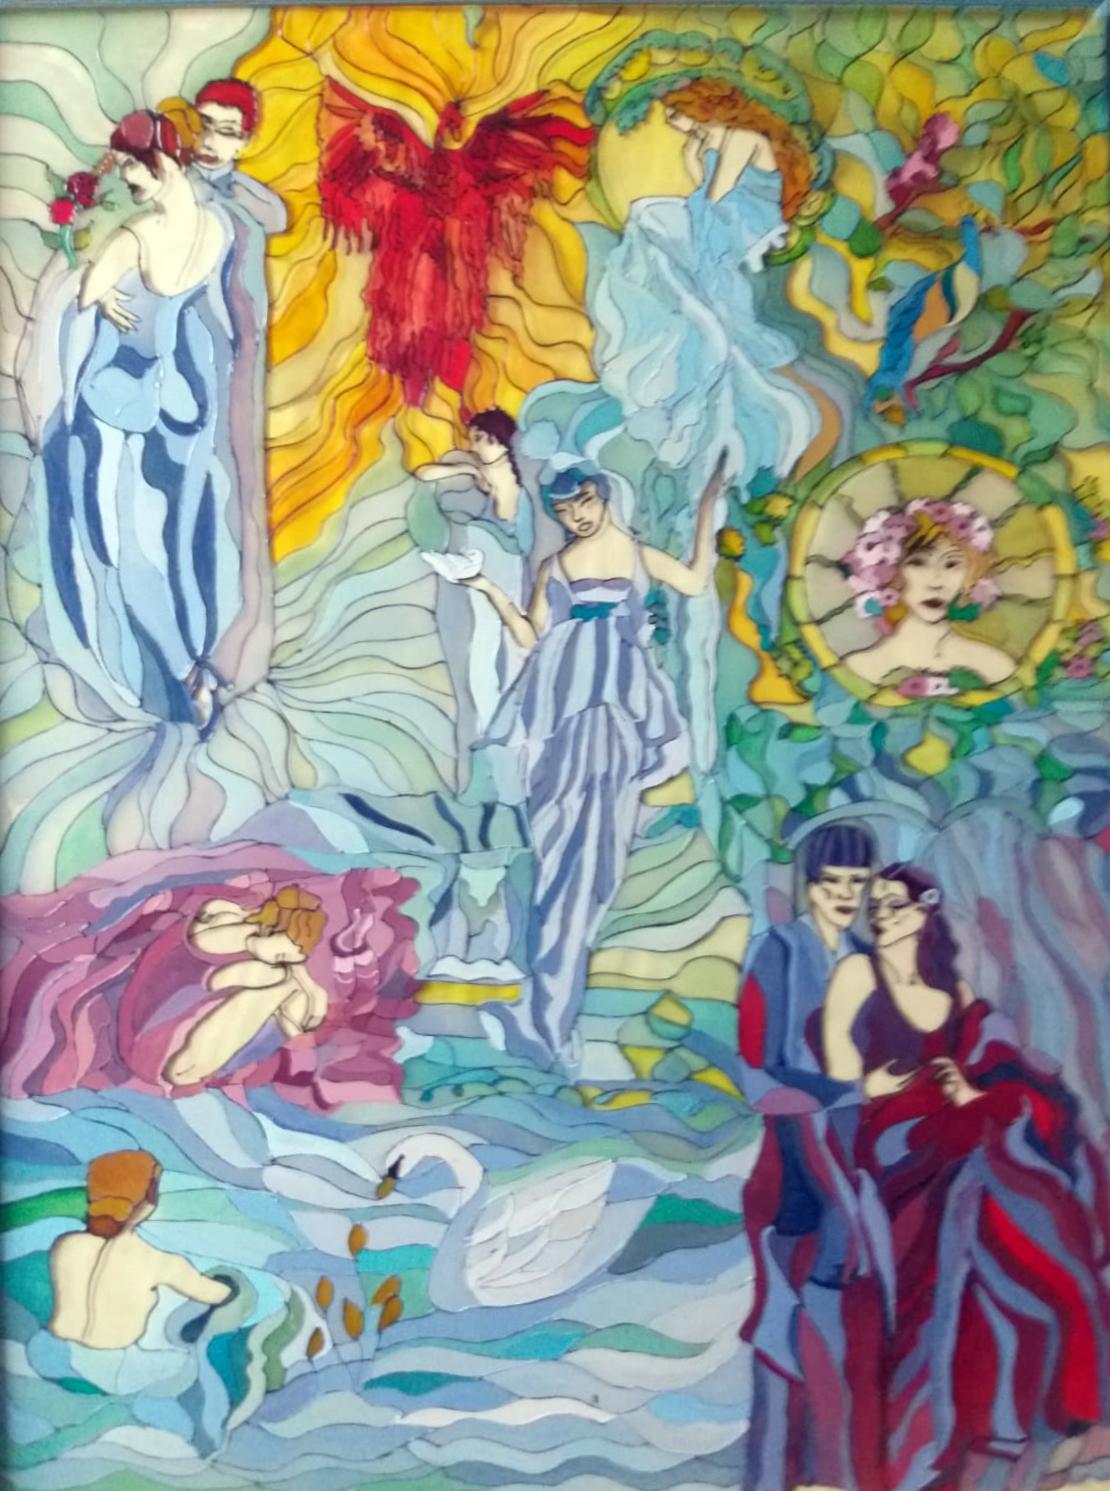 Fairytale n.13 - Pittura acrilico su vetro - cm 55x75